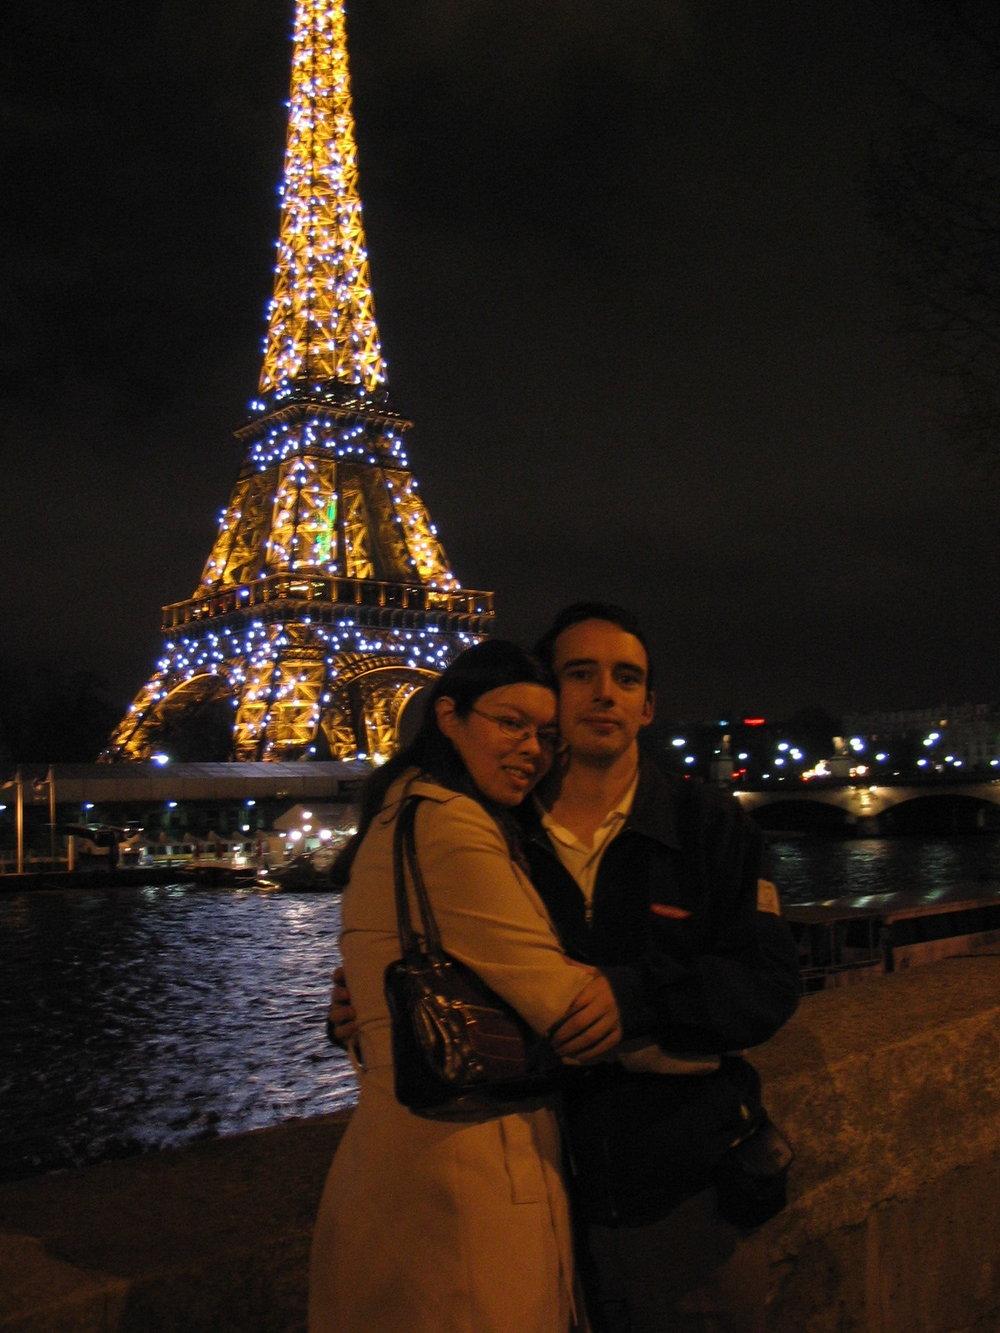 Tash Hatcher Eiffel Tower.jpeg